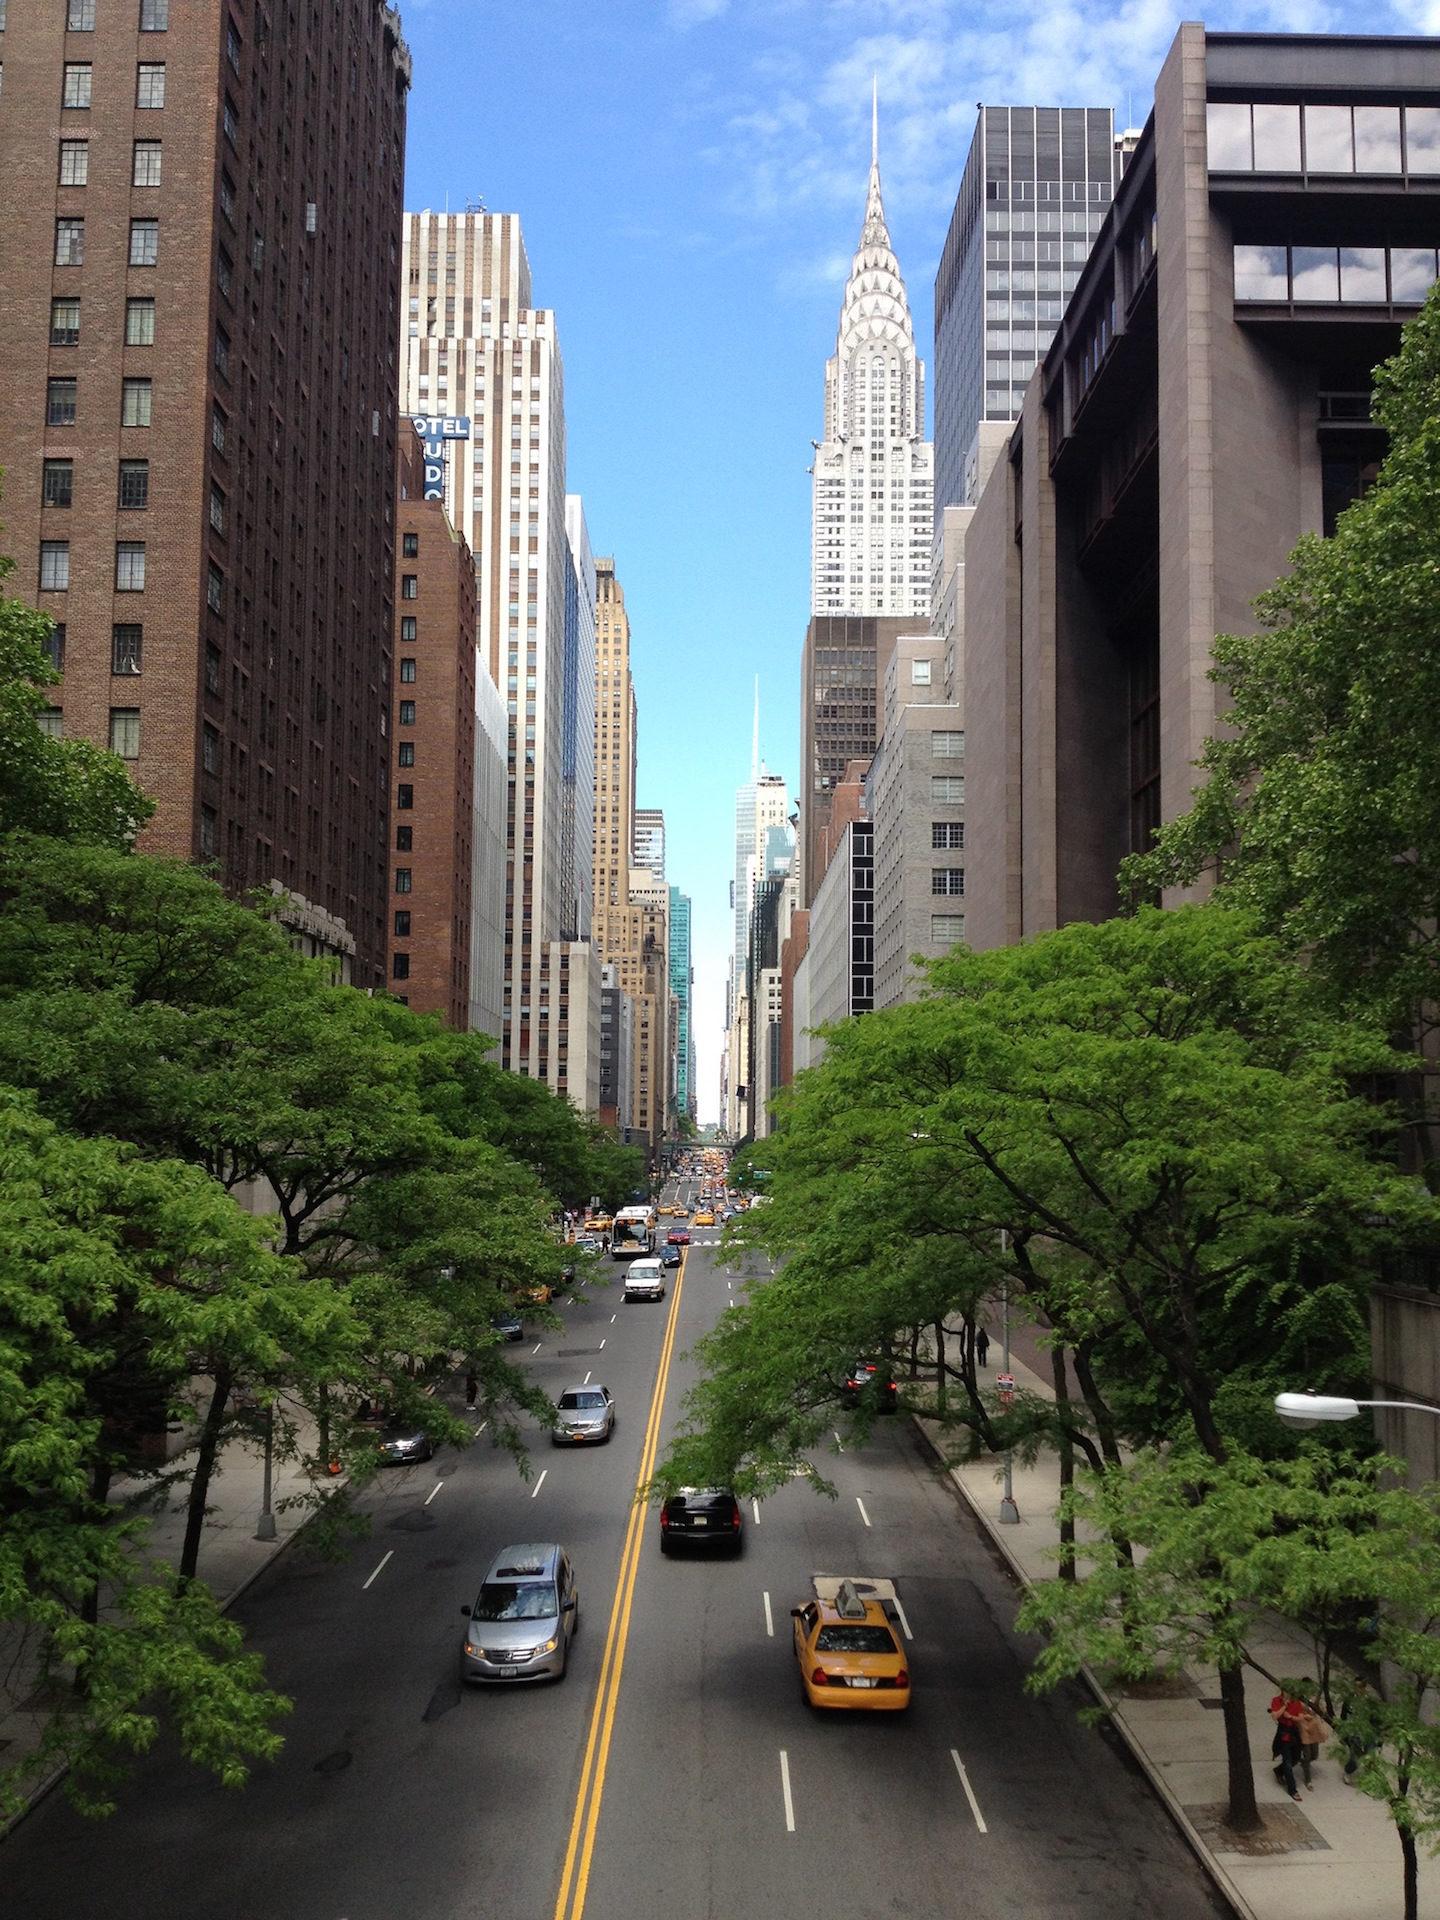 Città, Via, New york, Apple, grattacielo - Sfondi HD - Professor-falken.com